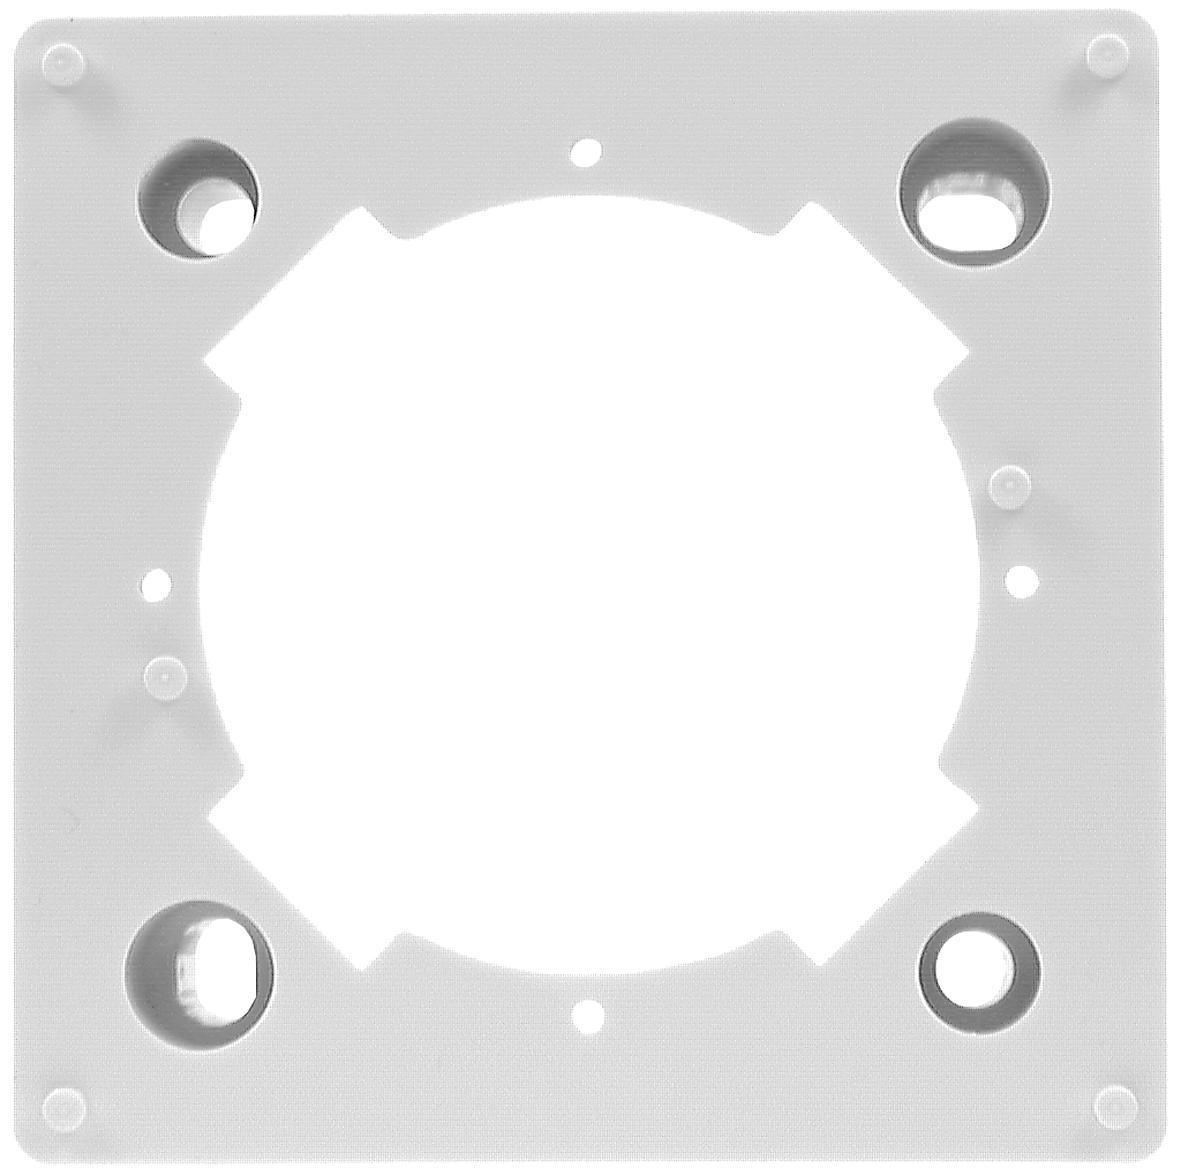 1 Stk SAT Aufputzrahmen für HSZUDxR88D, 80x80mm, RAL9010, TZU 1-00 HSZUDA88A-